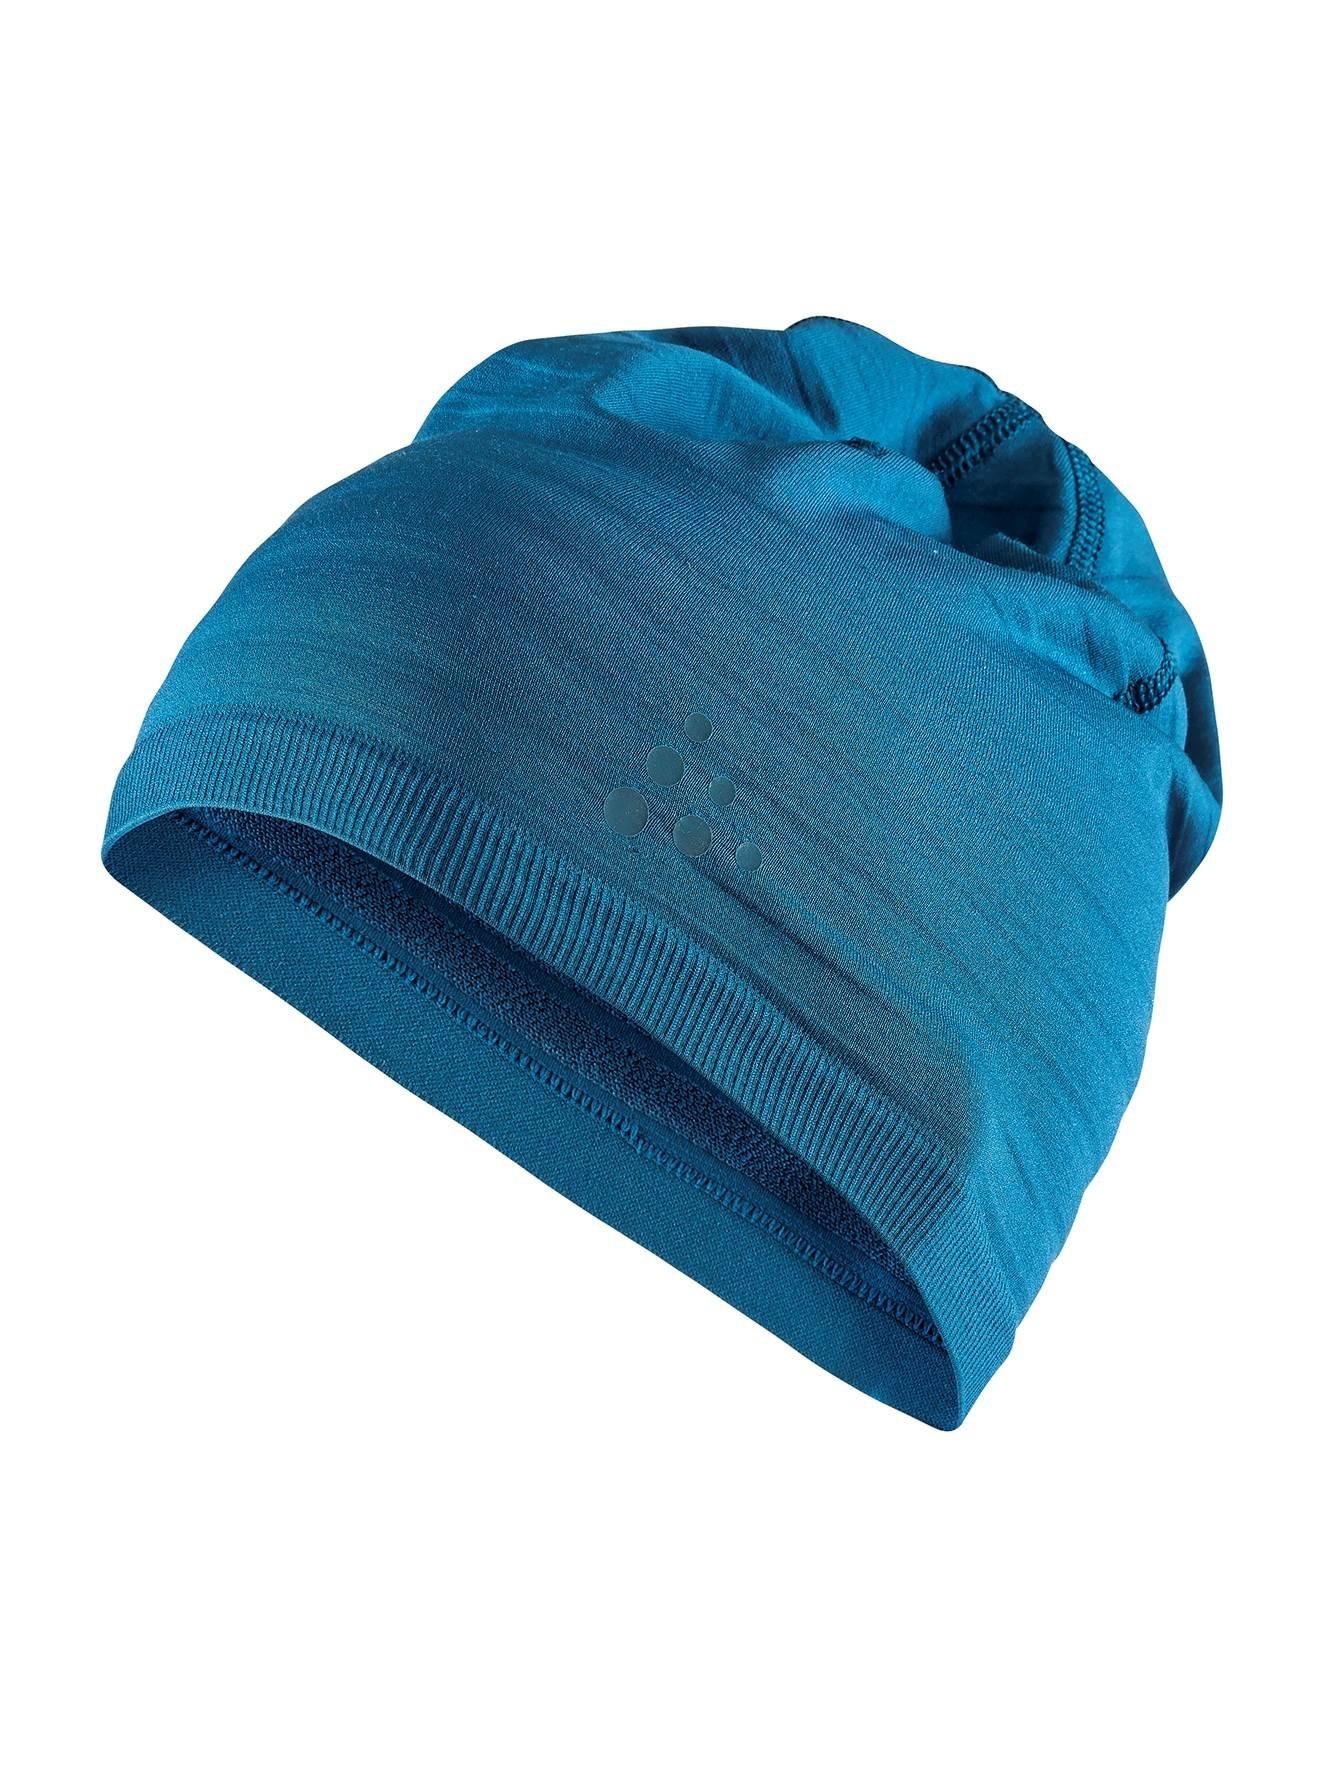 Craft Čiapky Warm Comfort Junior tmavo modrá